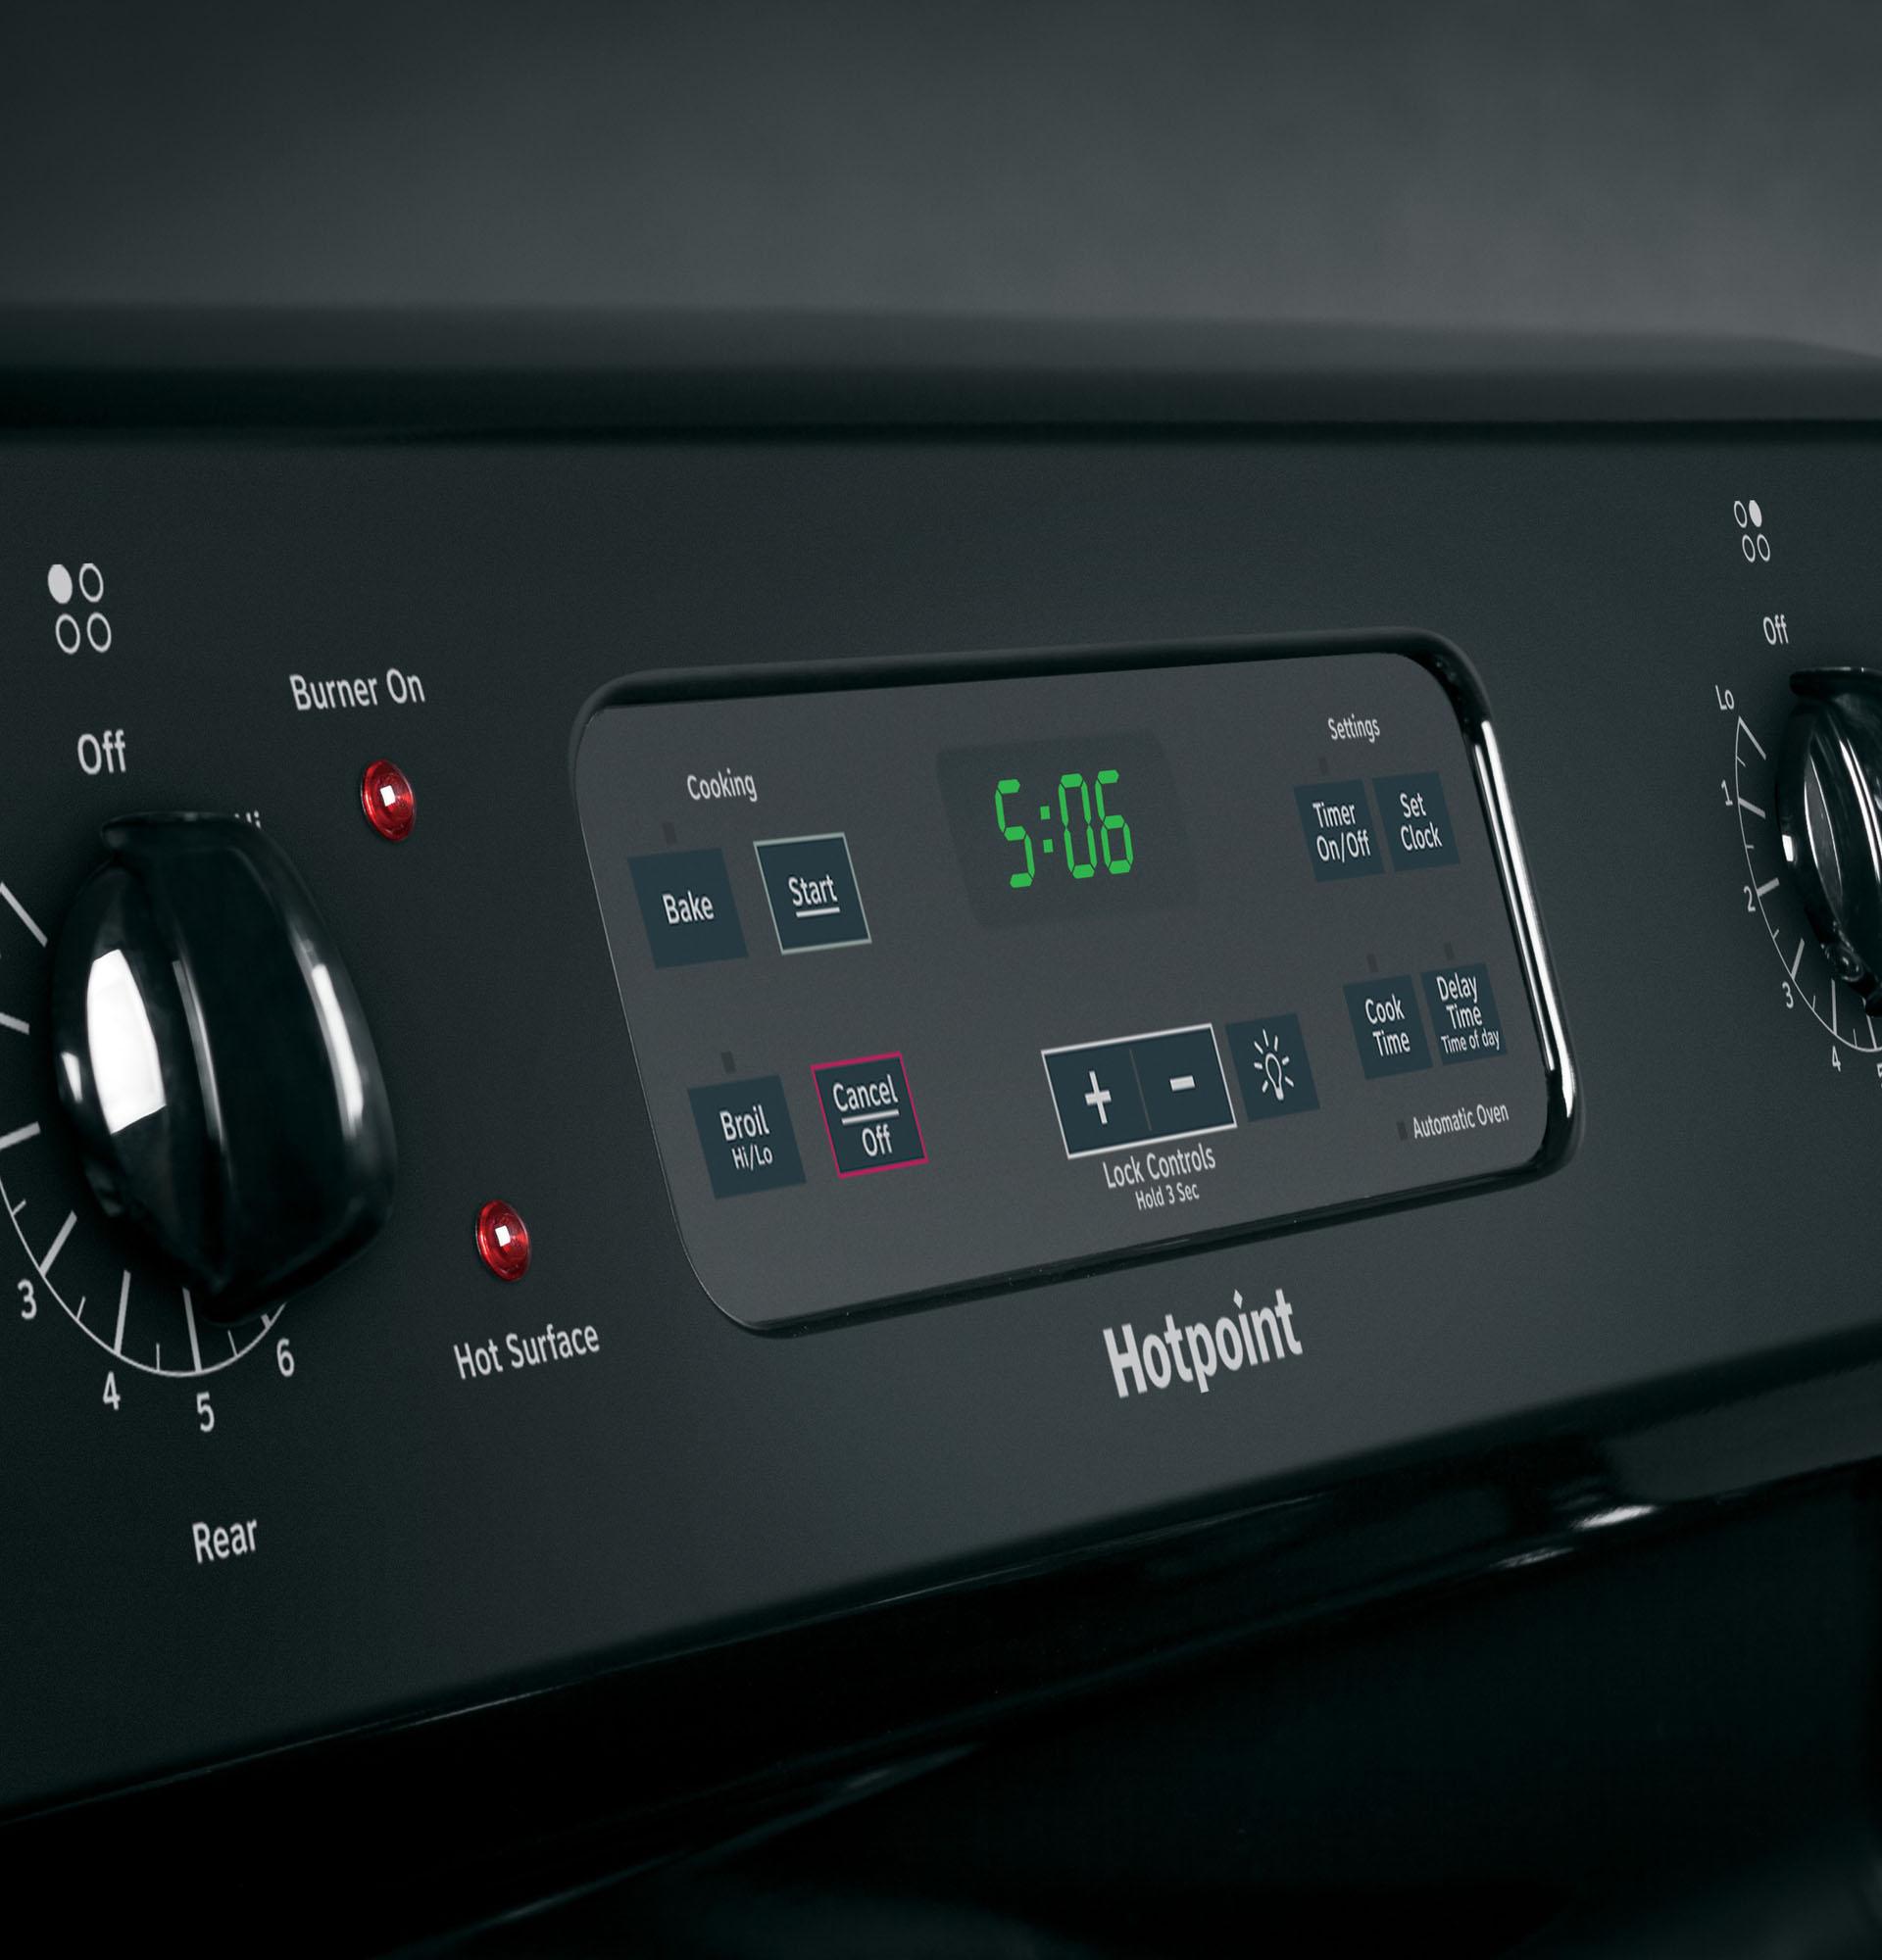 Hotpoint RB560DHBB 5.0 cu. ft. Freestanding Electric Range - Black